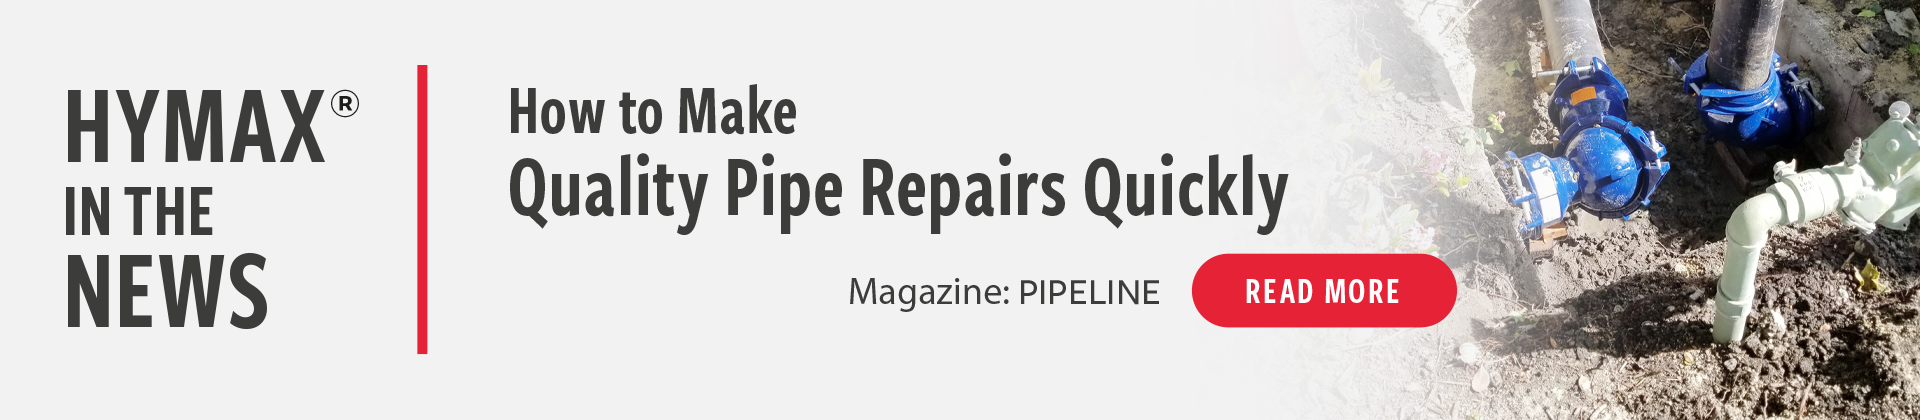 Quality-Pipe-Repairs-Quickly-NJ-Pipeline